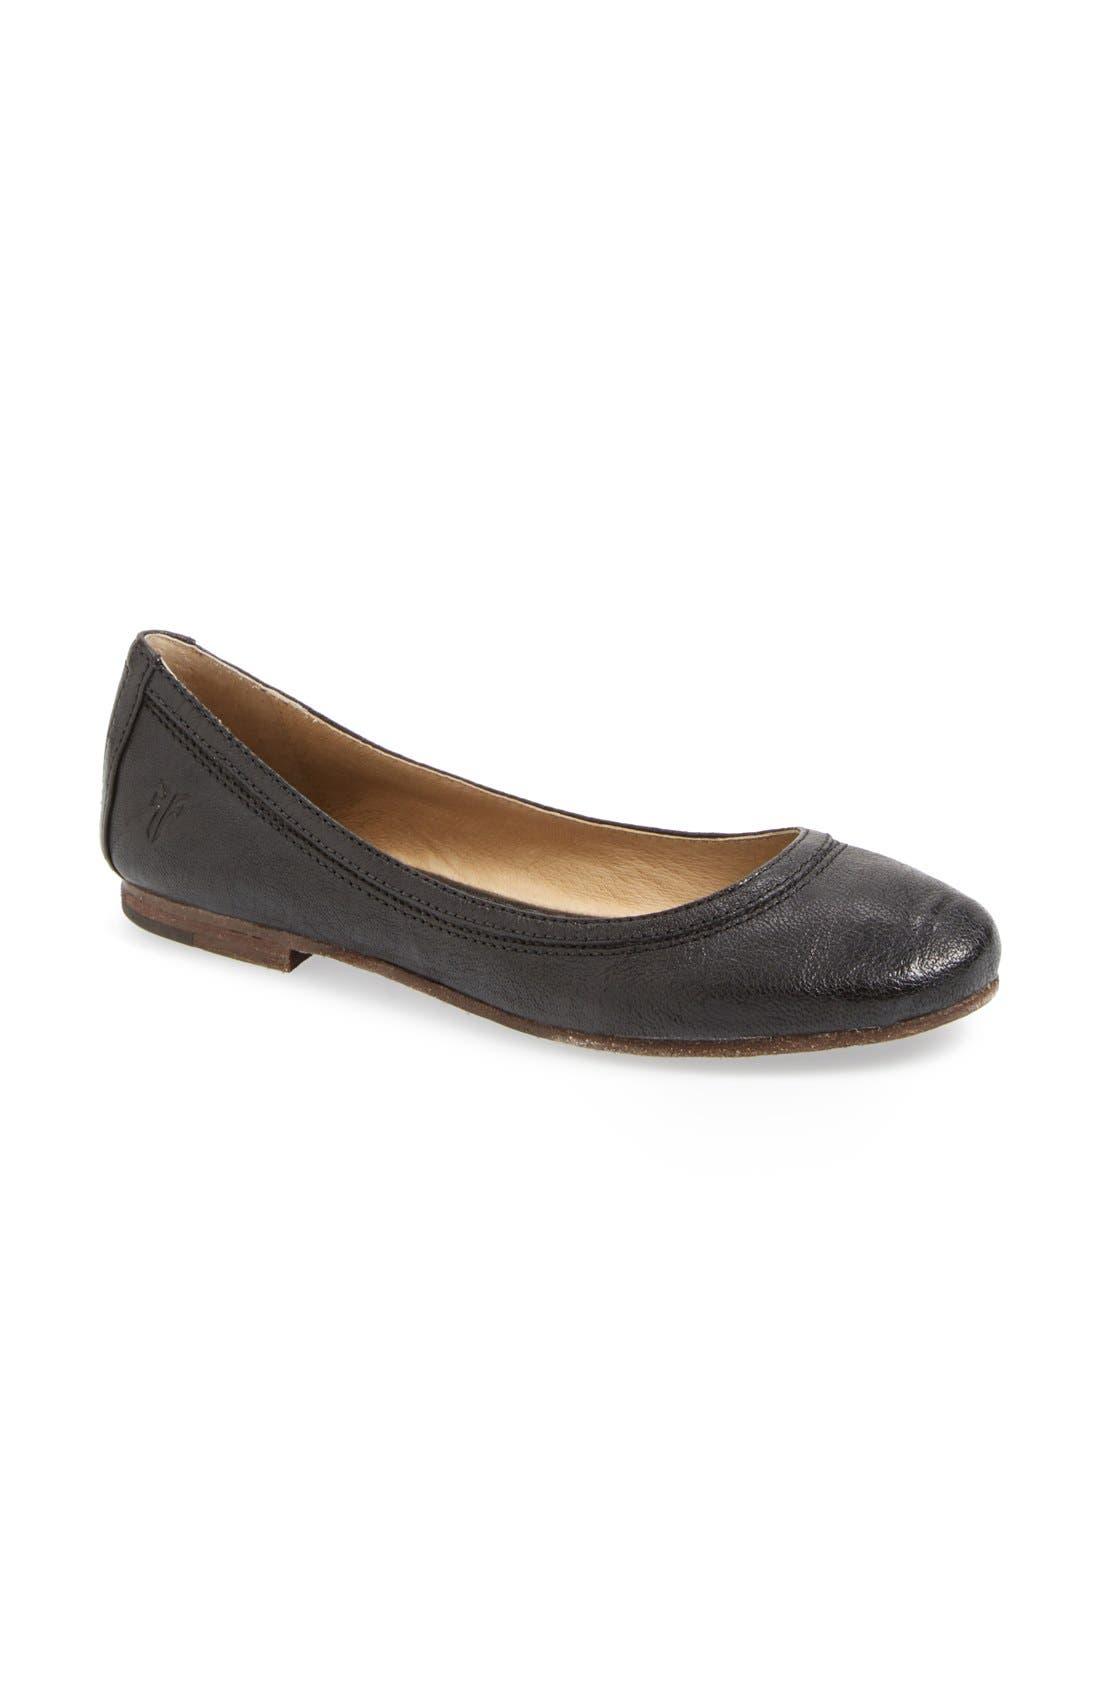 'Carson' Ballet Flat,                             Main thumbnail 1, color,                             Black/ Black Leather